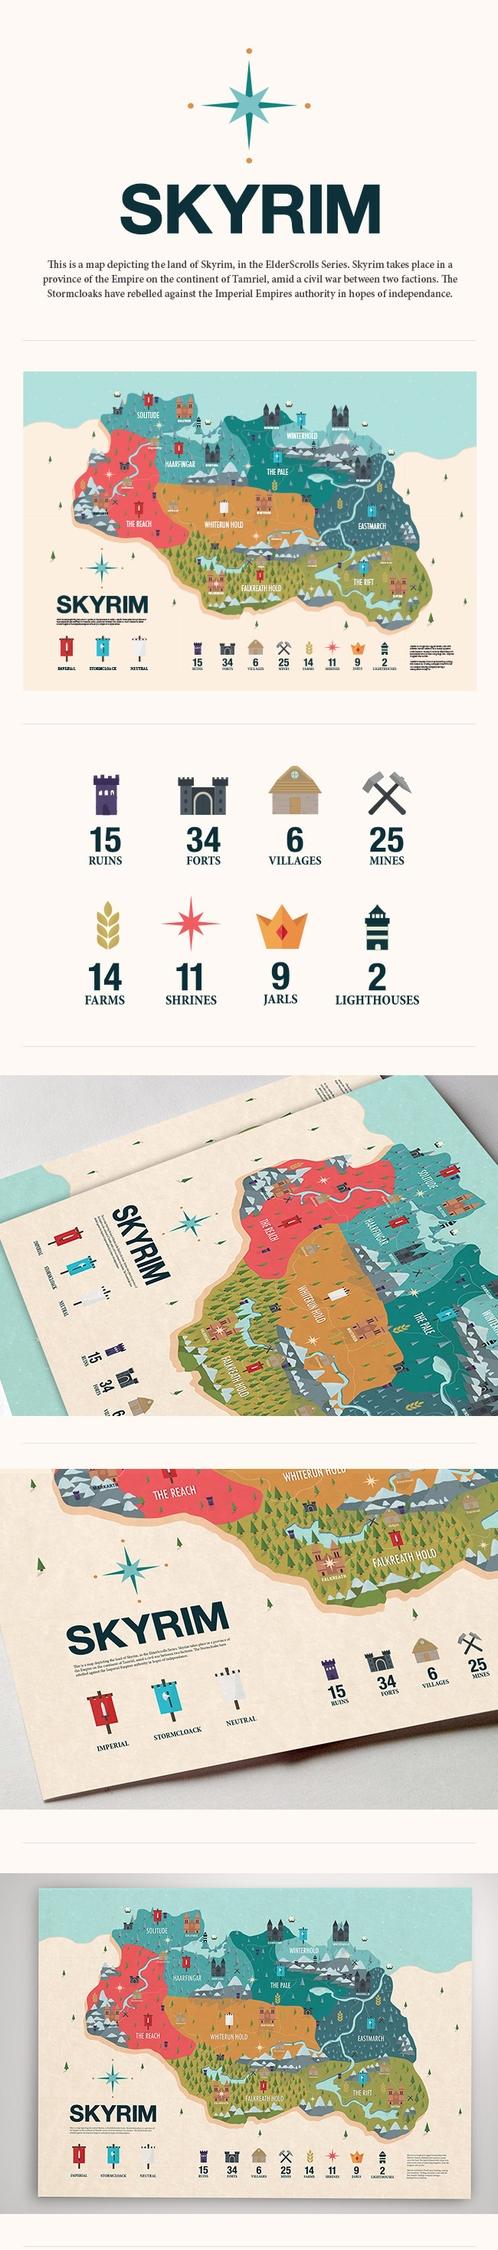 skyrim, infographic, map, illustration - tj93 | ello